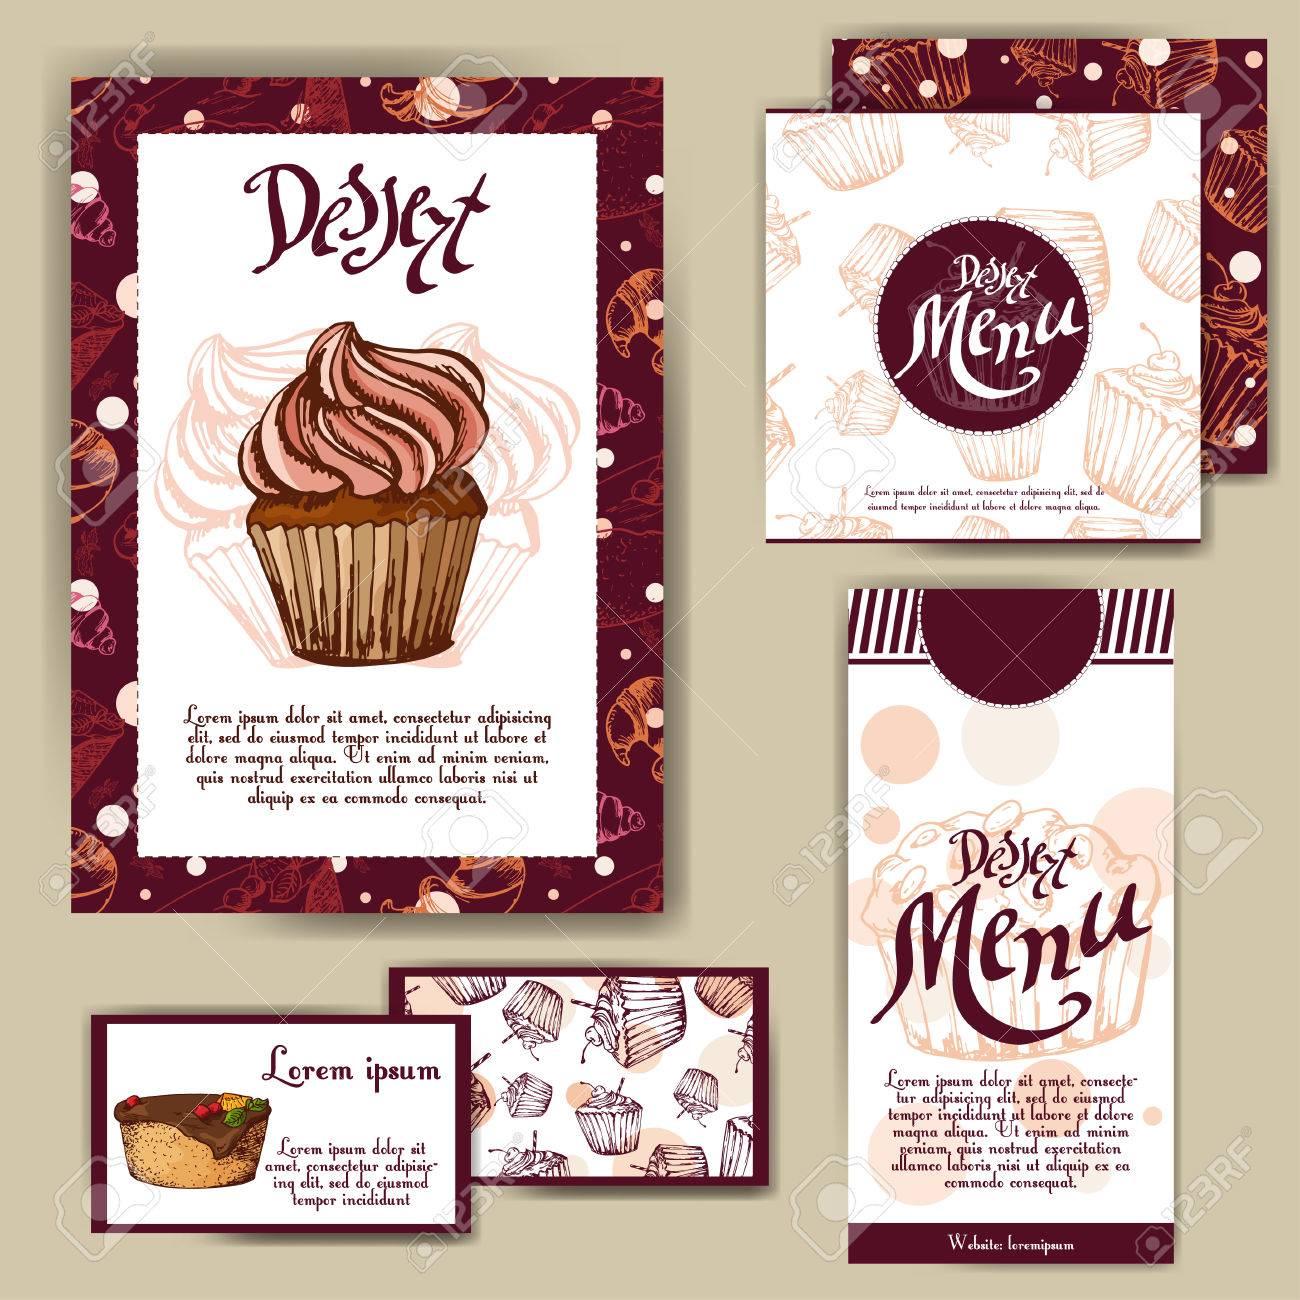 Vector Template With Hand Drawn Sketch Bakery Dessert Menu Design